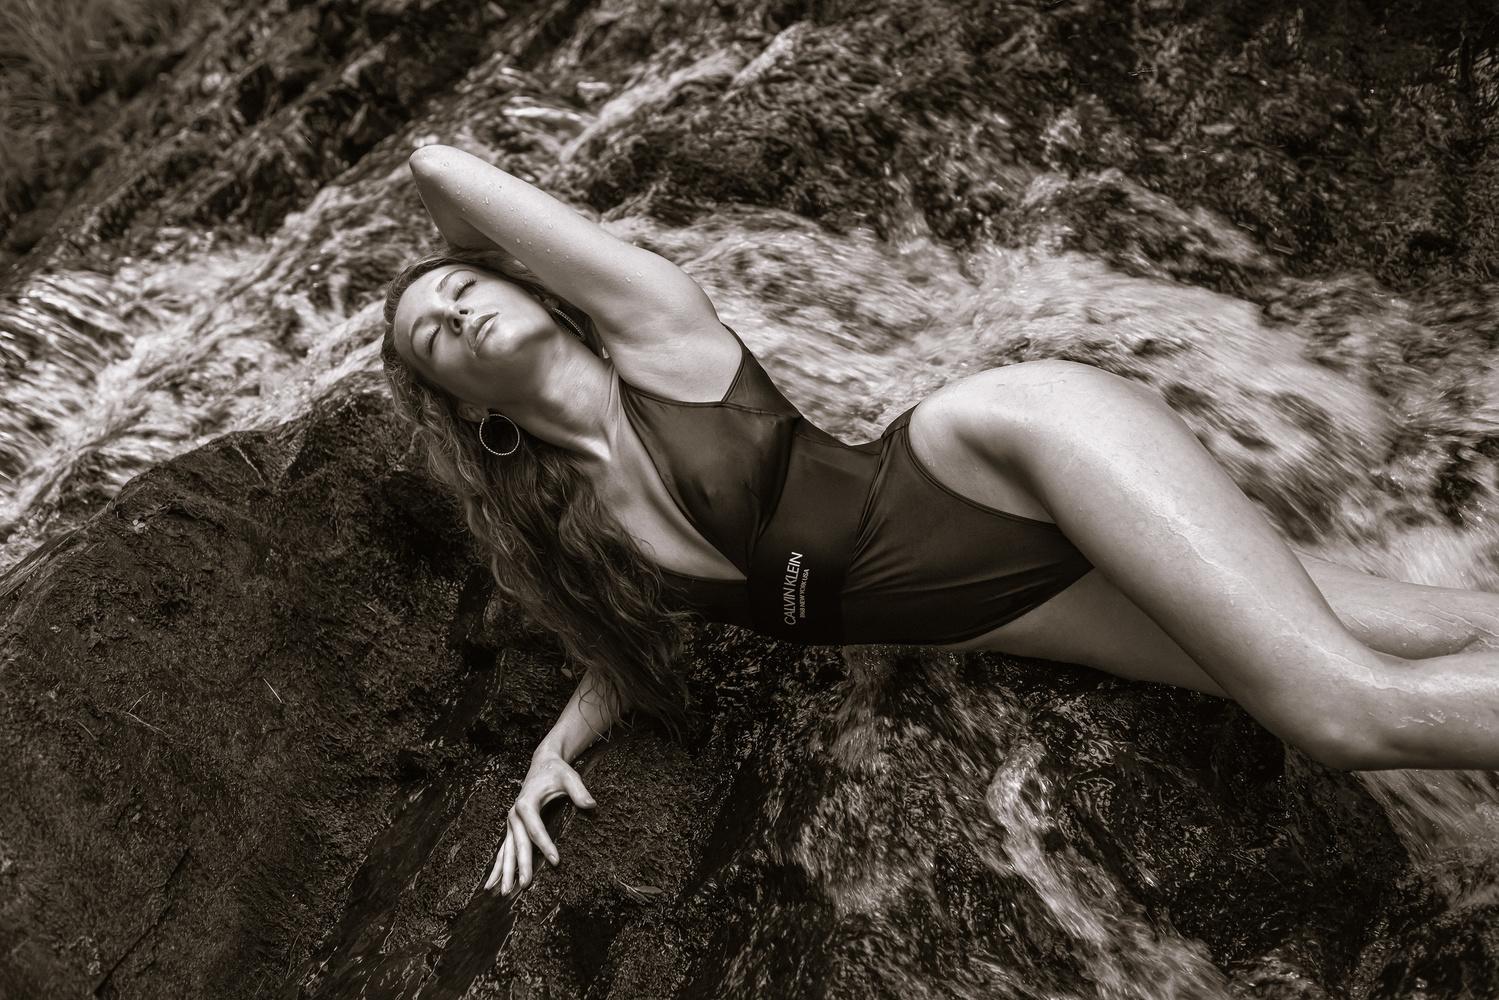 Julia in Calvin Klein Swim at Westfield Falls by Mark Johnson